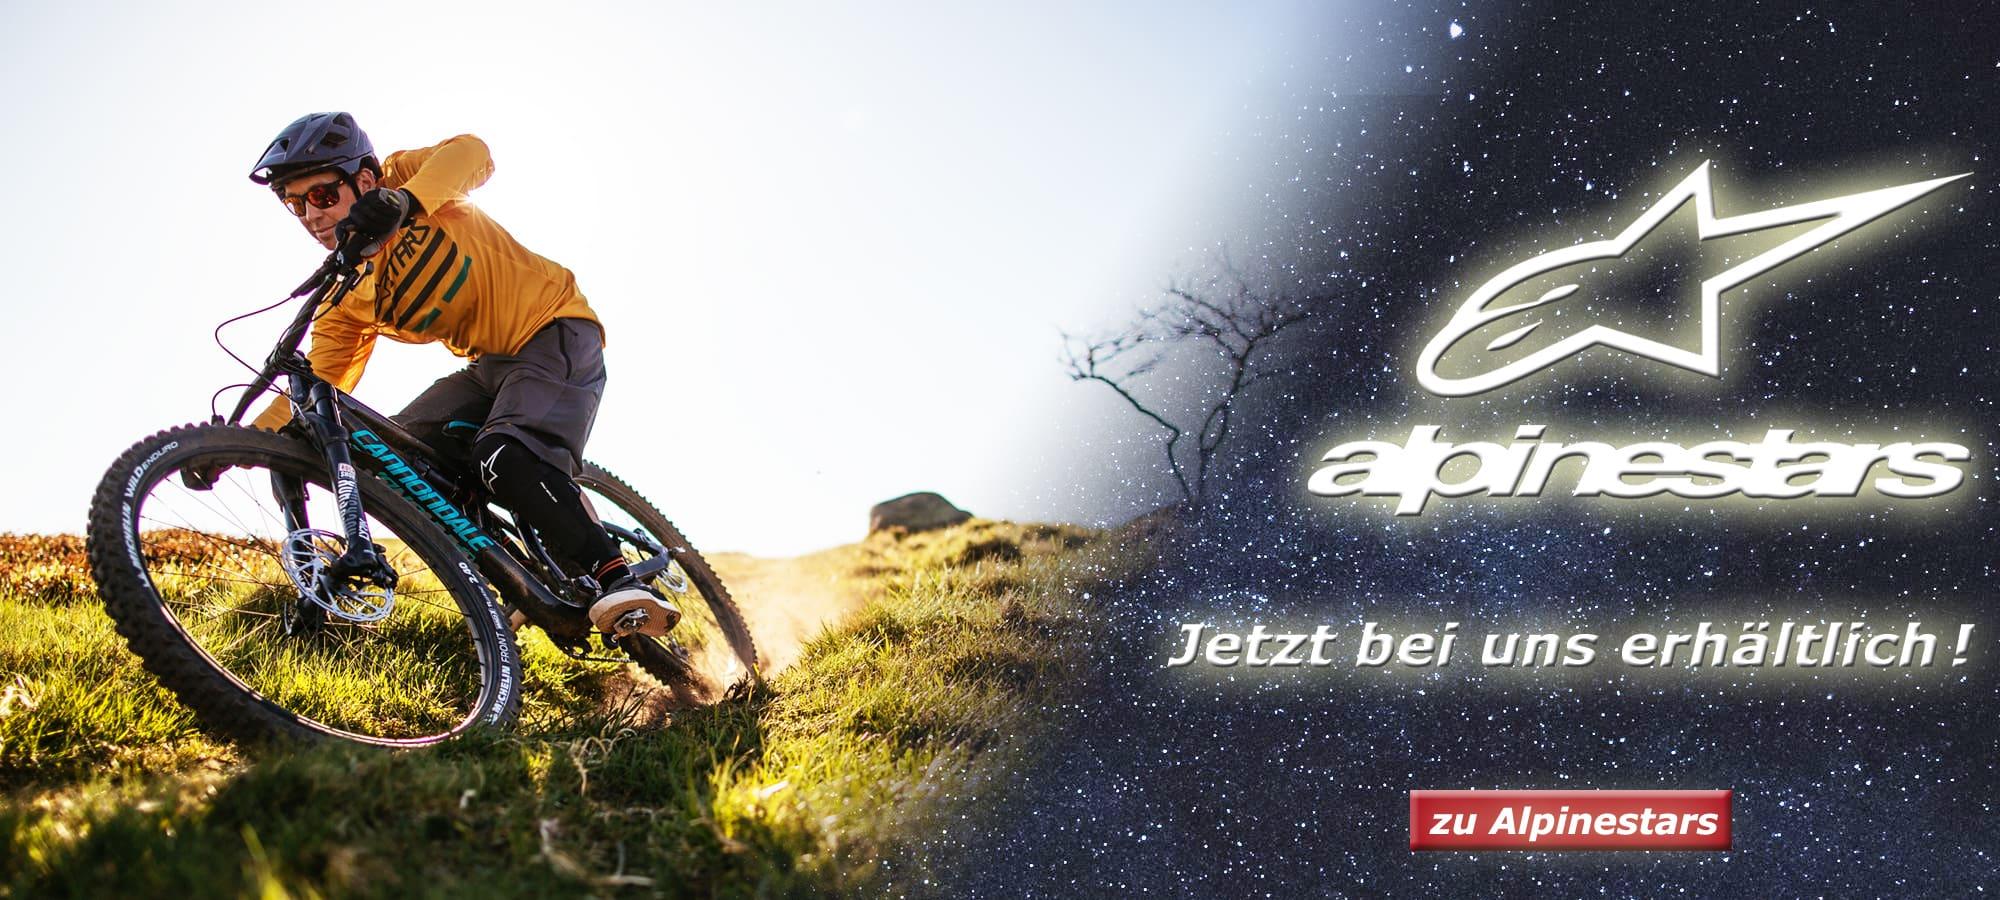 Alpinestars MTB, Enduro & Downhill Bekleidung - Neu im Sortiment